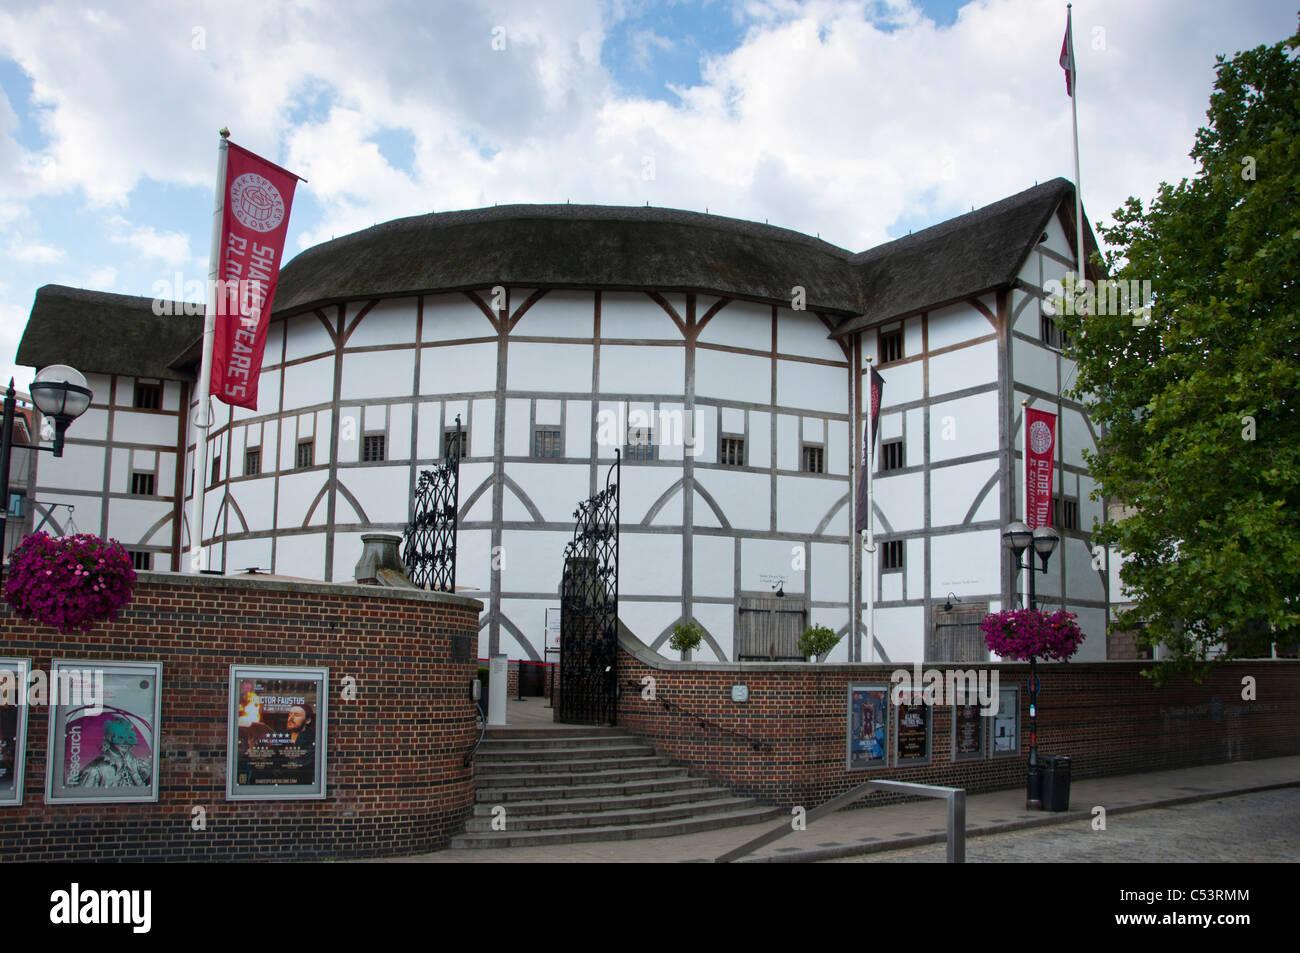 Shakespeare's Globe theatre South Bank, London. UK - Stock Image